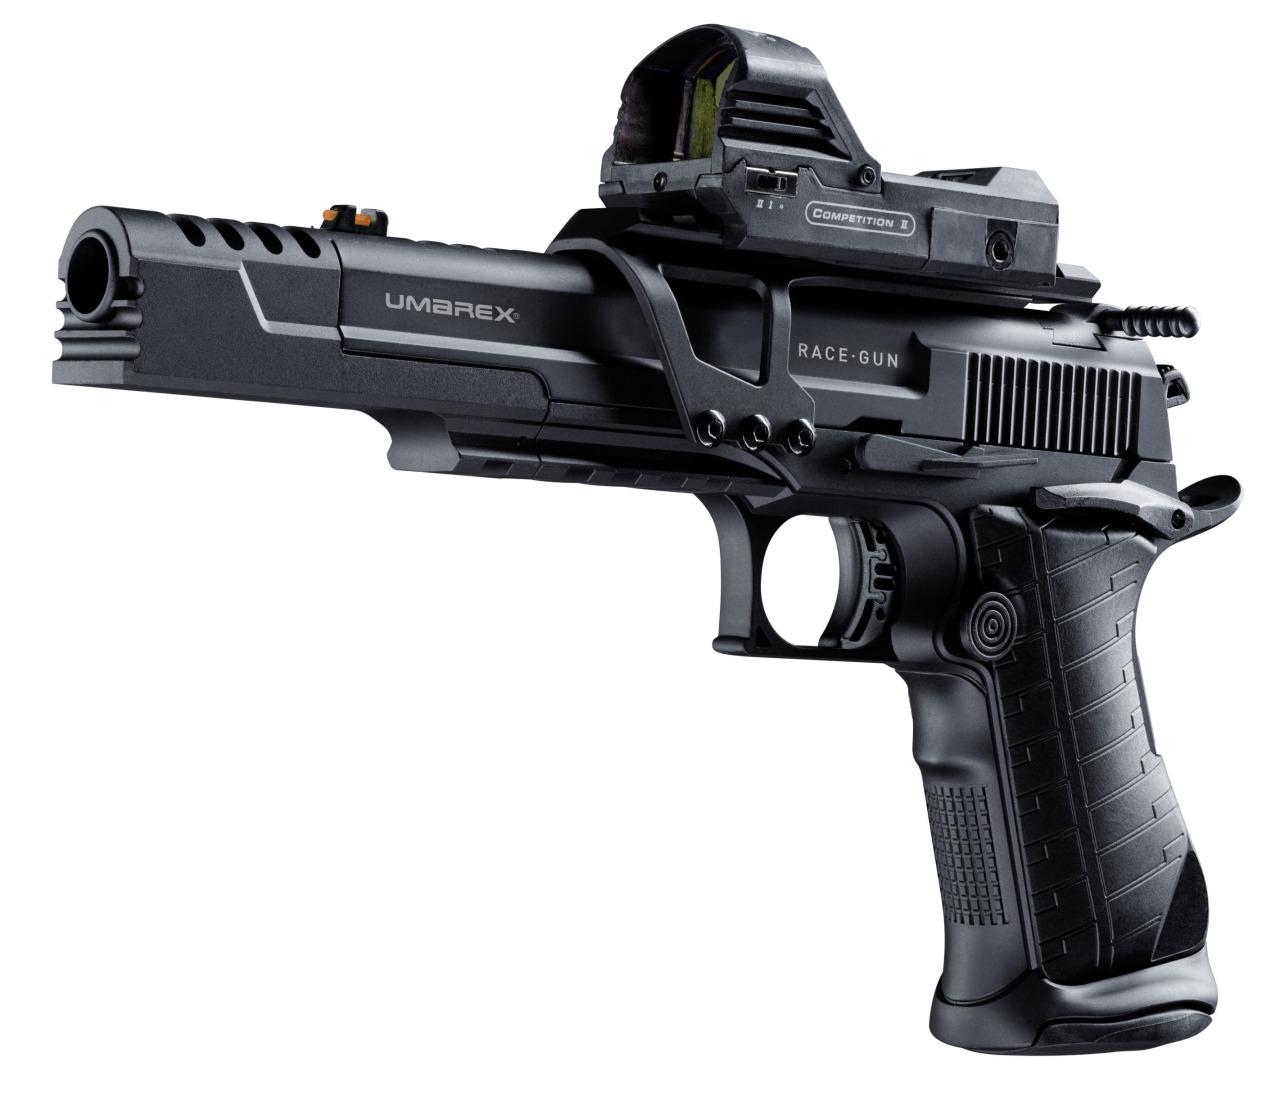 Airgun Explorer — Umarex Race Gun Set blowback CO2 airgun